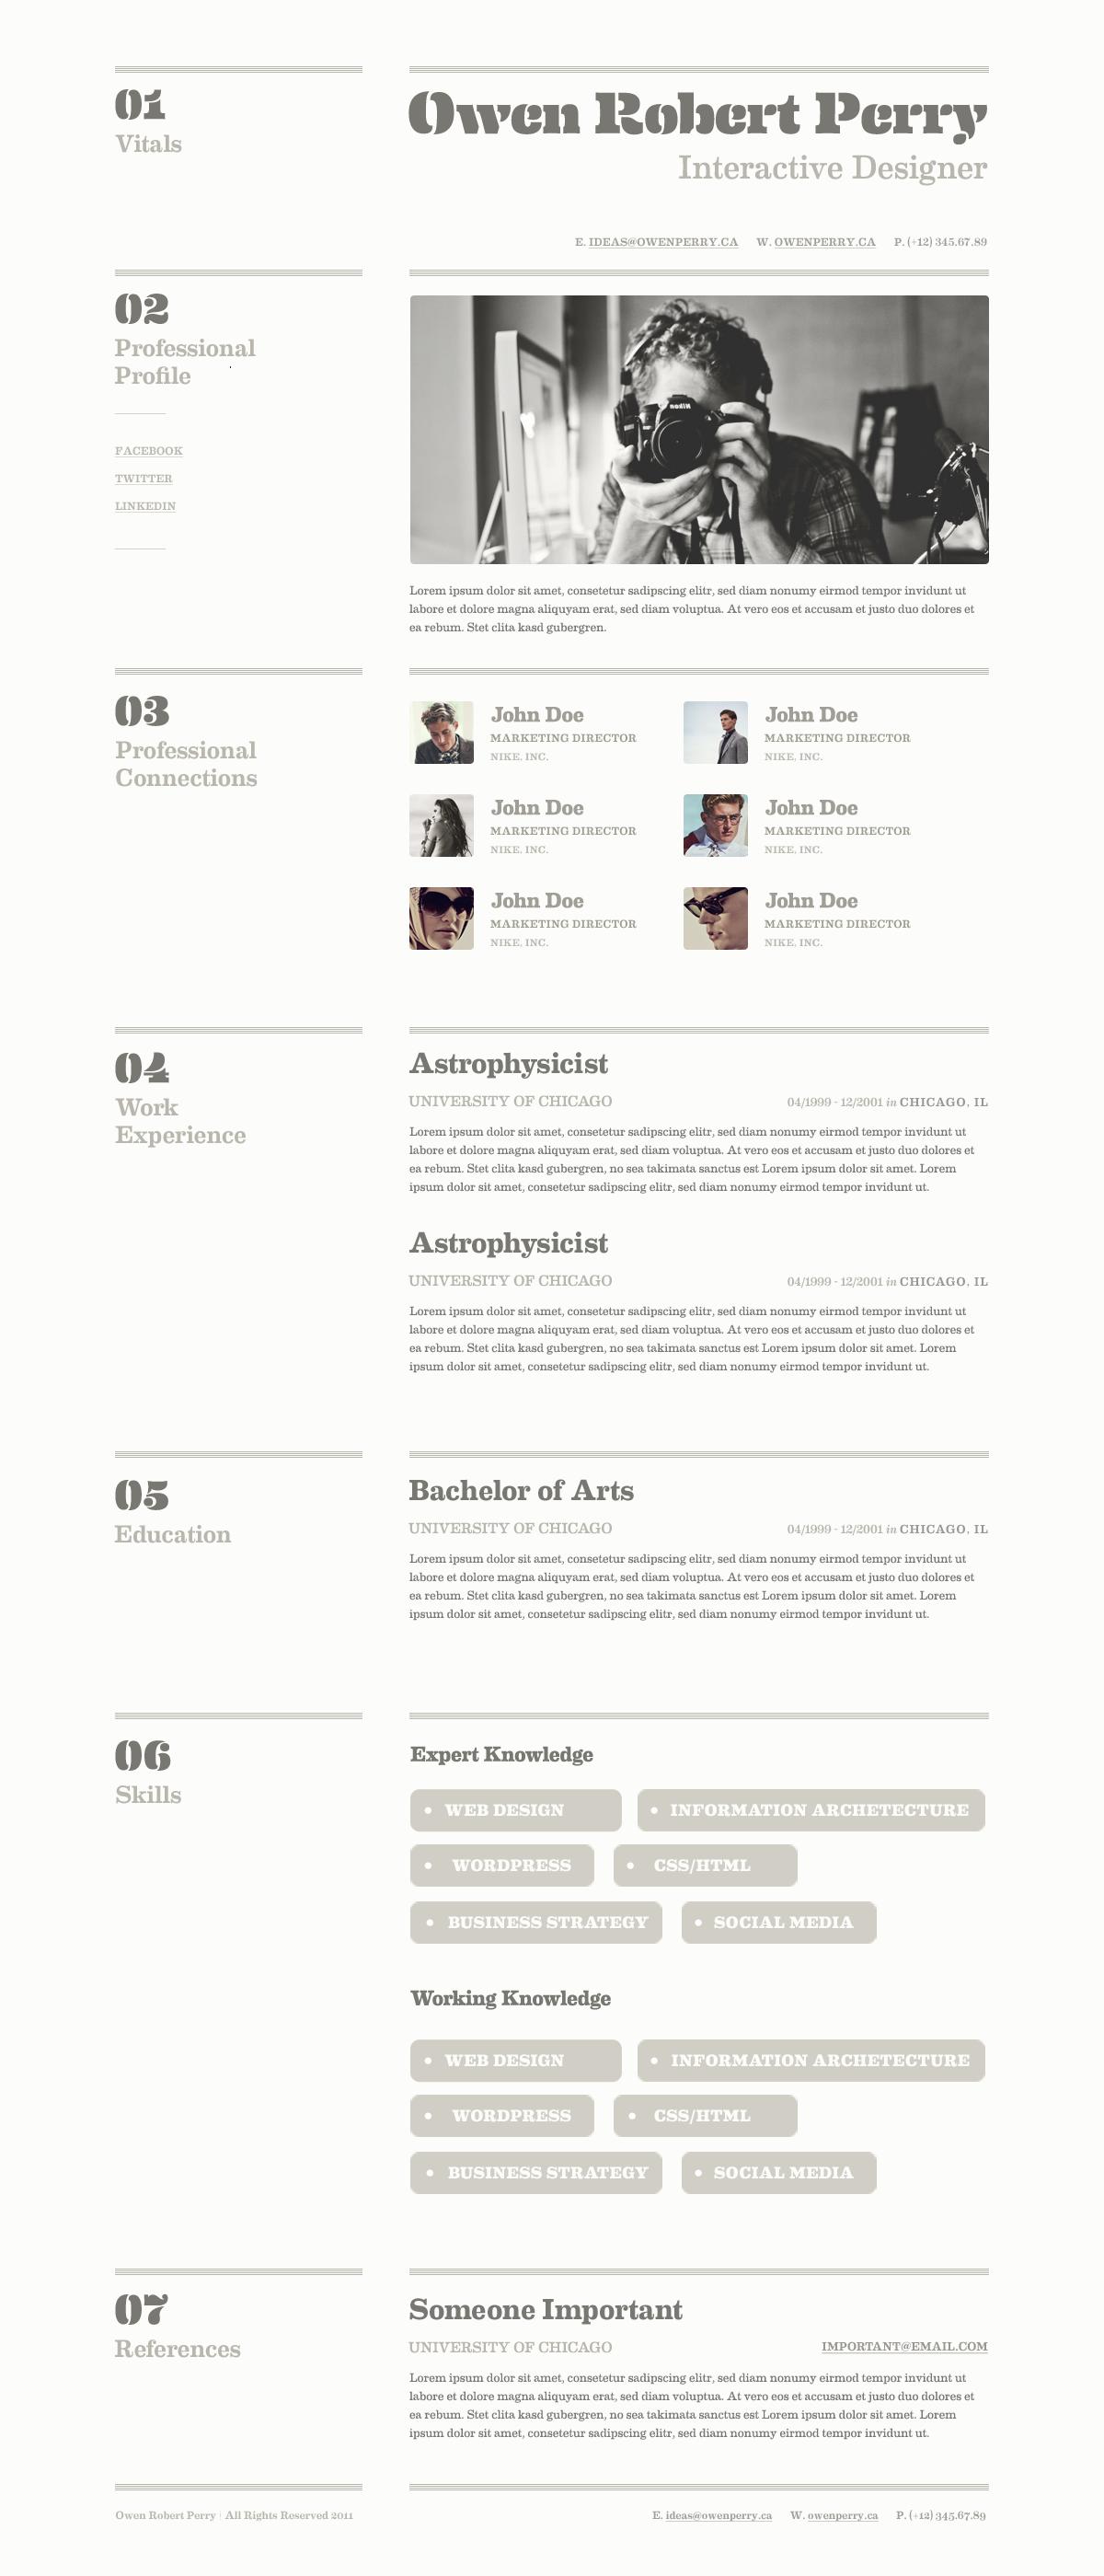 Resume Design Resume design layout